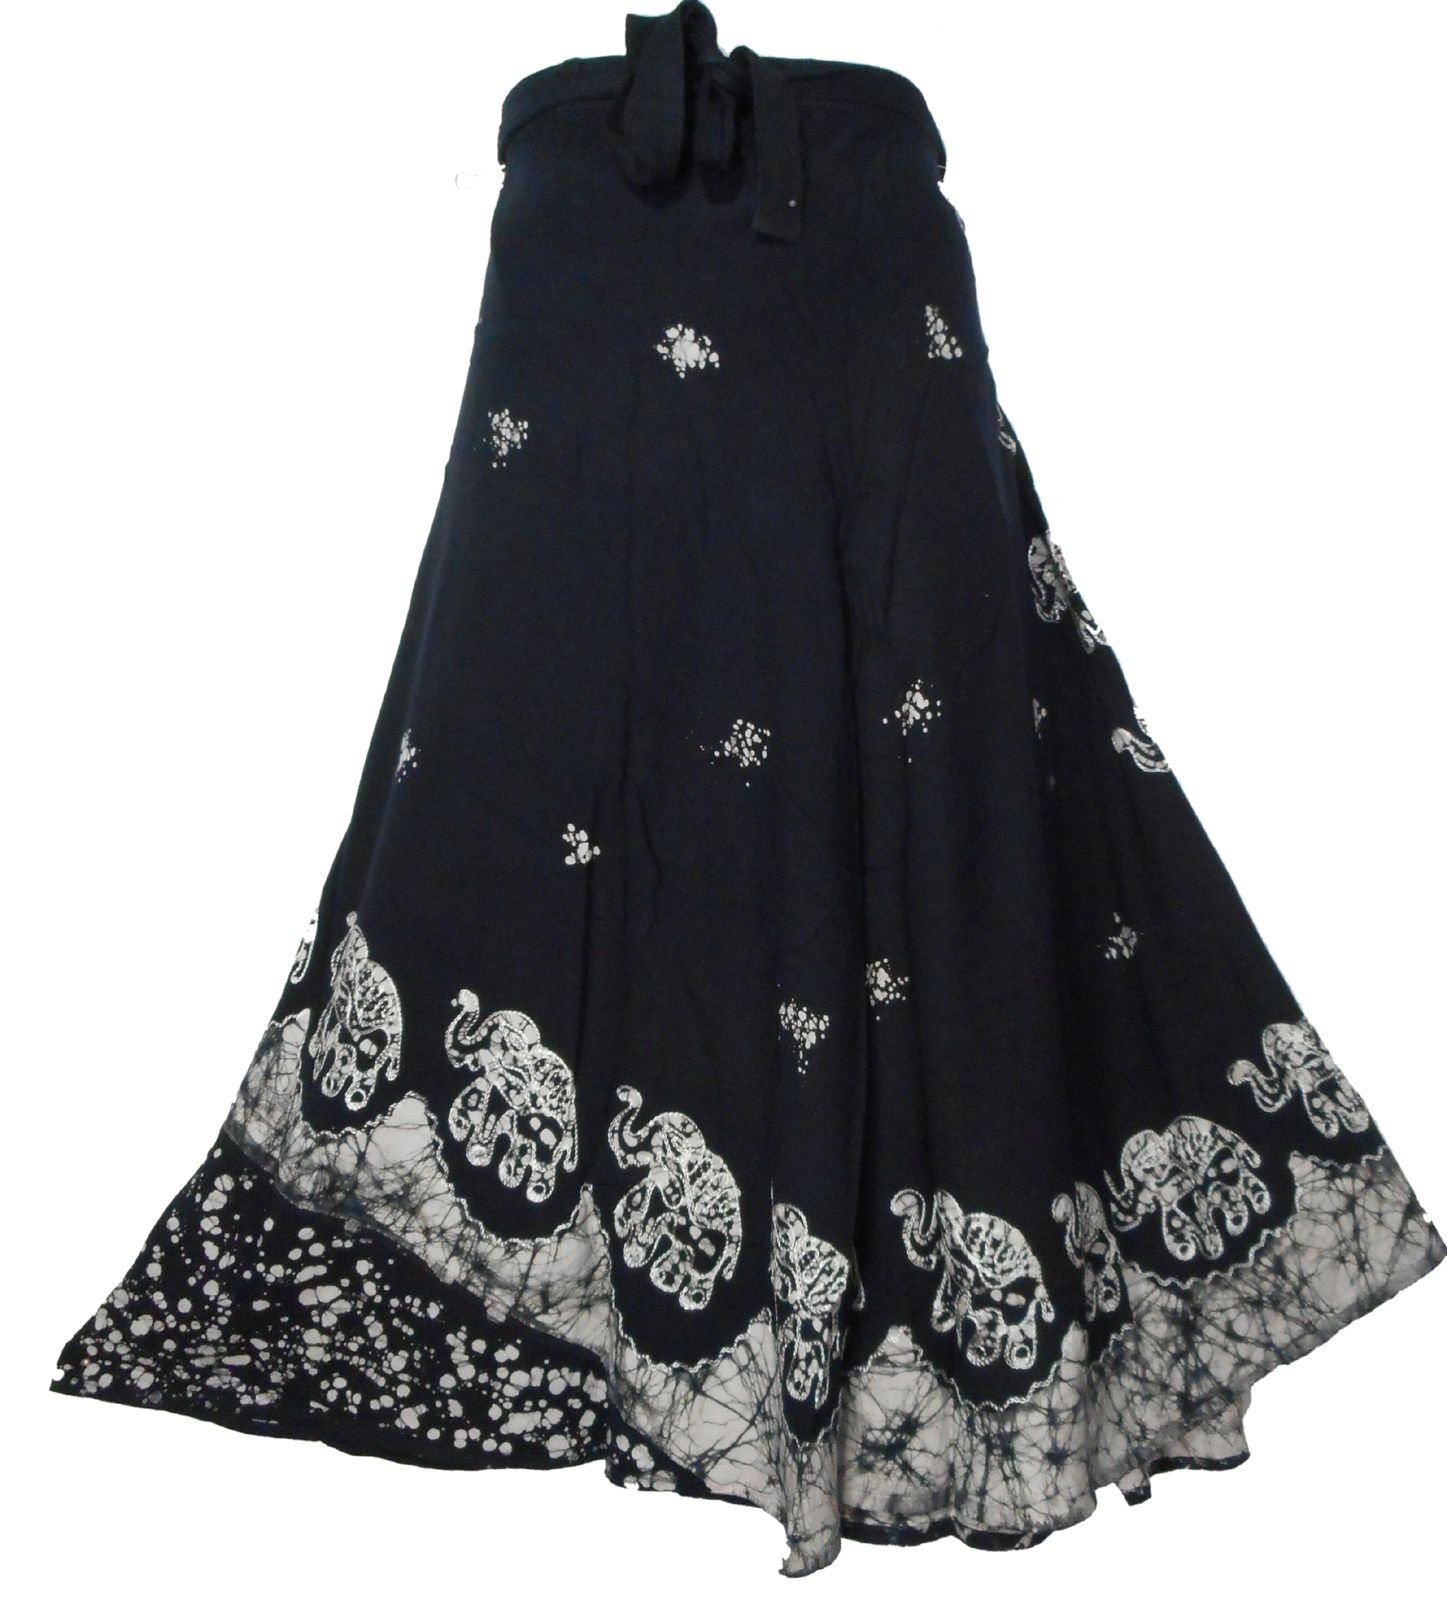 5276bff6cd Get Quotations · Decoraapparel Batik Wrap Around Skirt African Wax Print  Women Flared Skirt Maxi Bright Colors